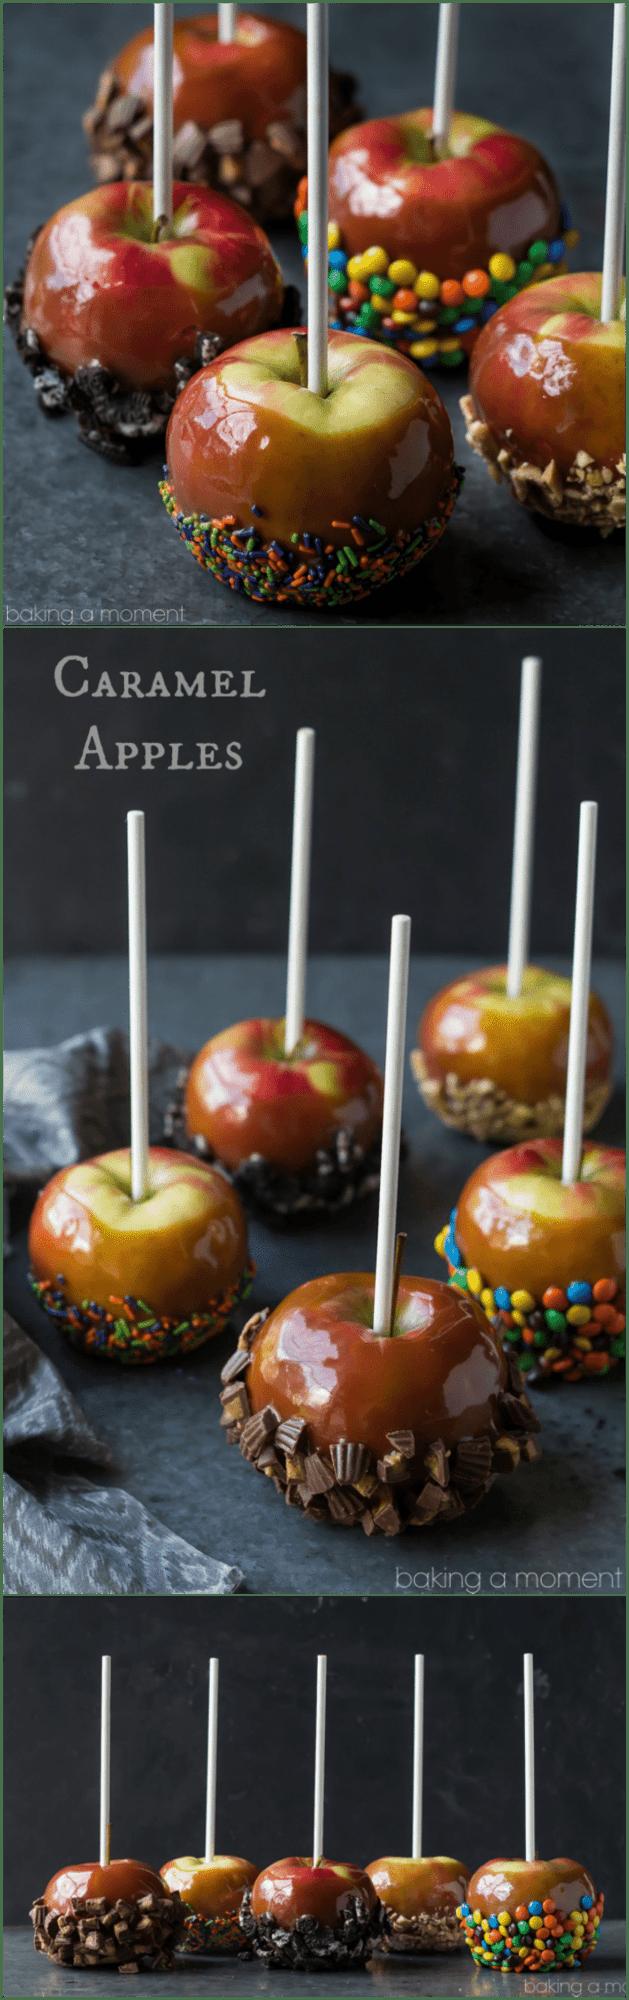 Caramel Apples 5 Ways | Baking a Moment